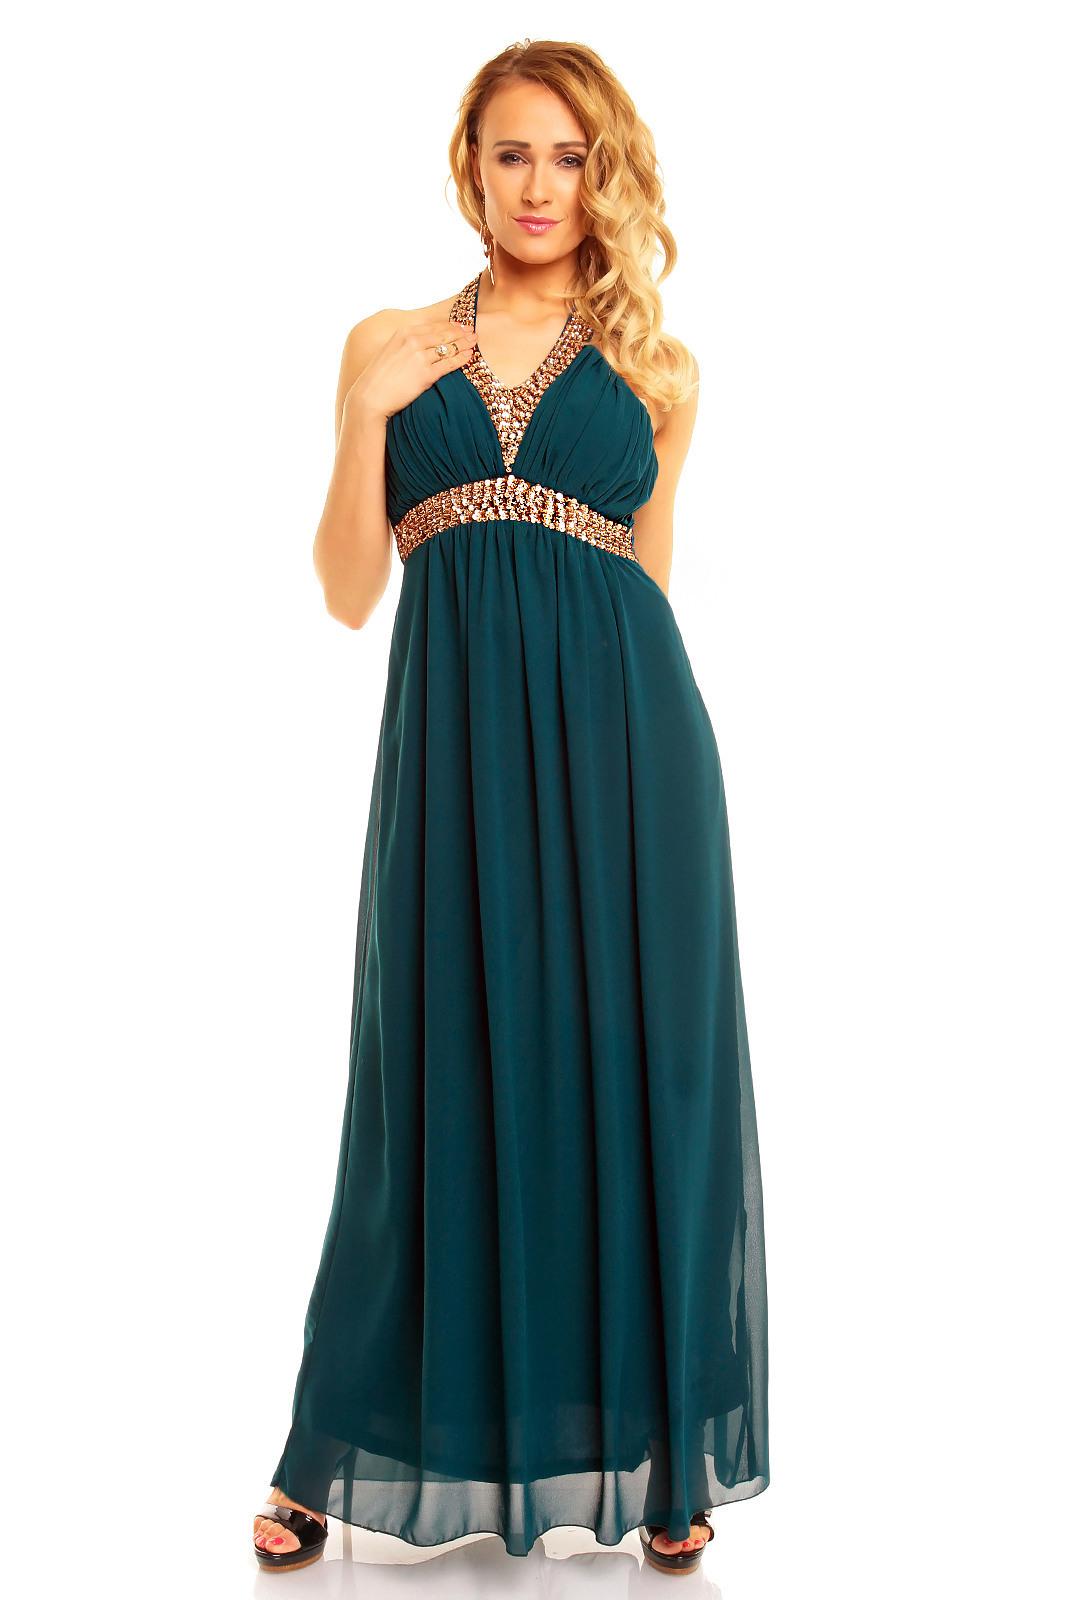 Genial Kleid Festlich Grün Stylish15 Cool Kleid Festlich Grün Boutique